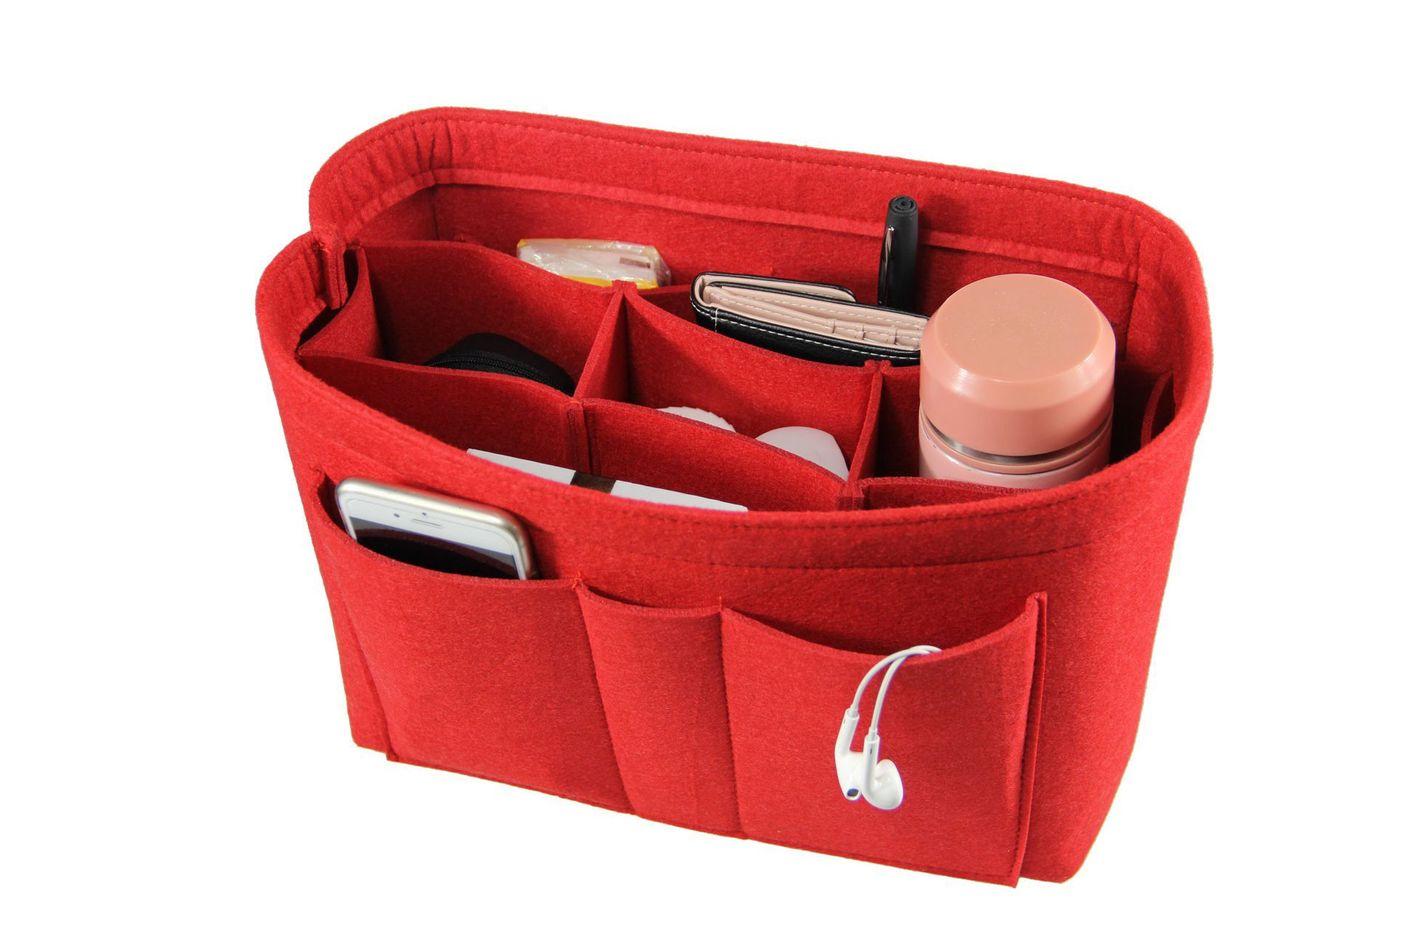 The Structured Bag Organizer Ettp Felt Fabric Purse Handbag